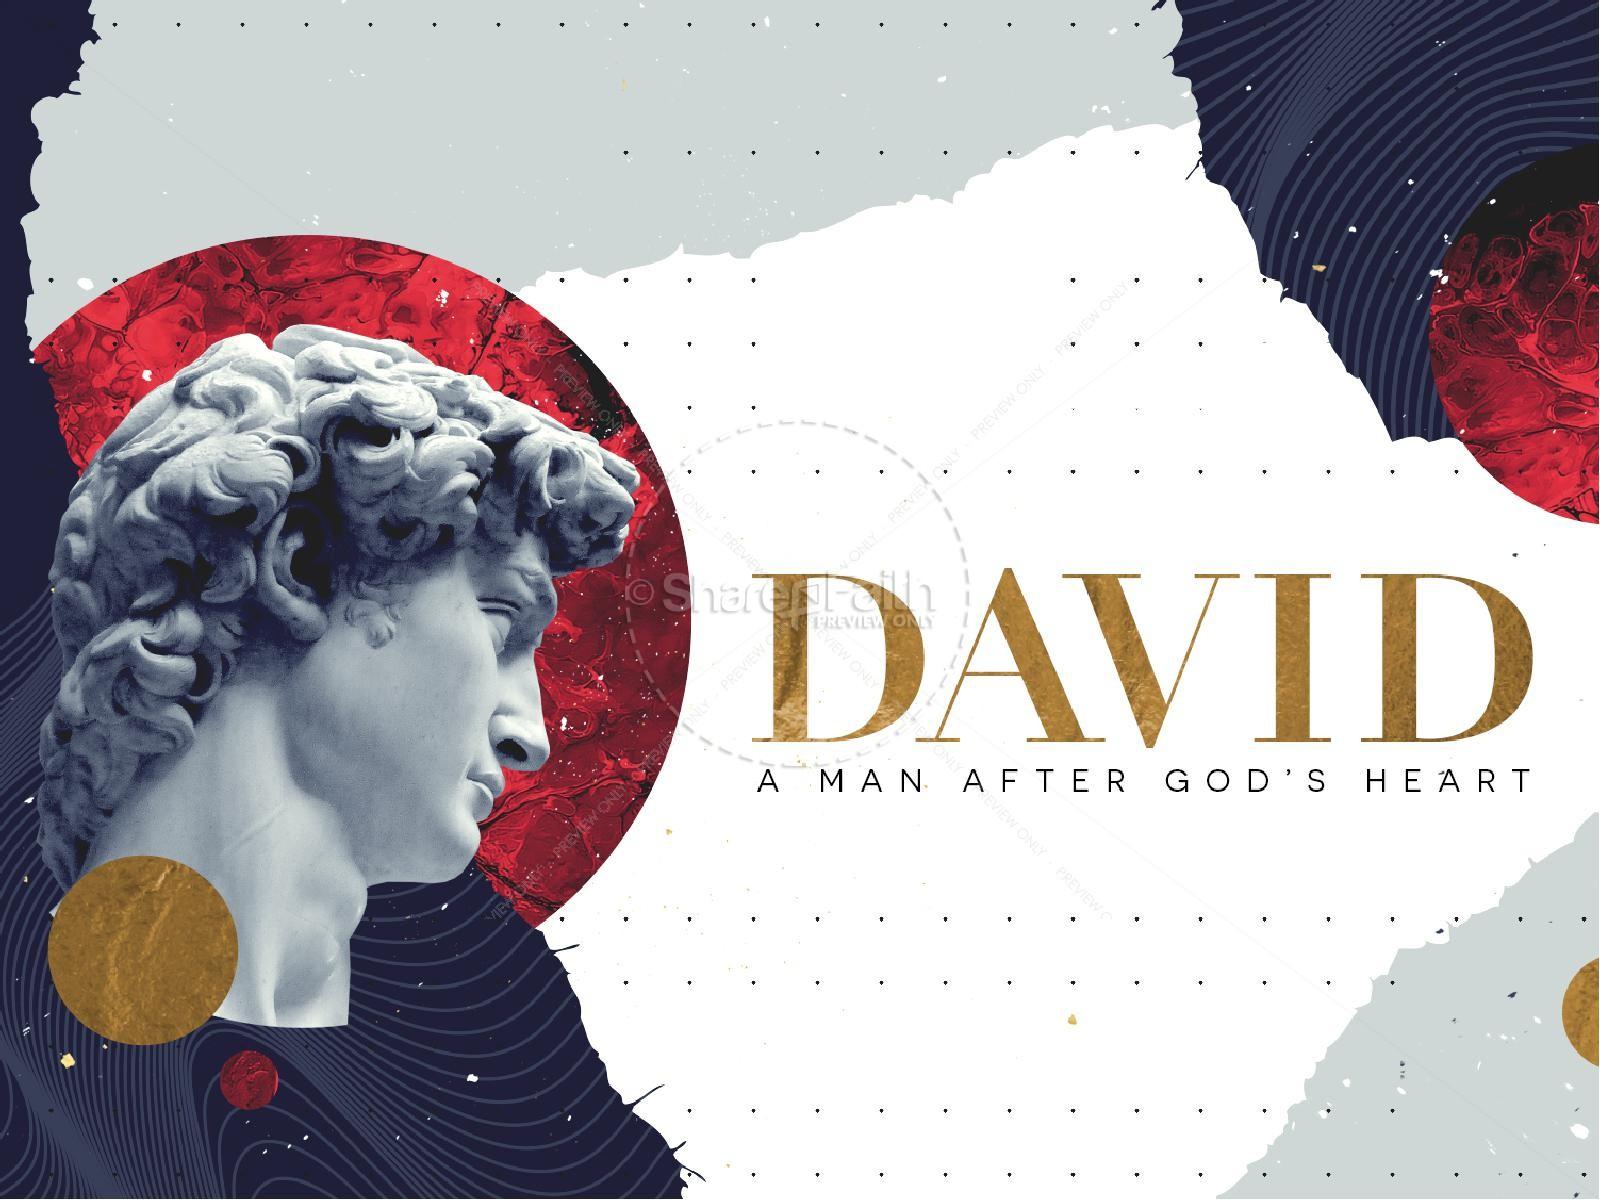 David A Man After God's Heart Sermon Series Graphic | slide 1